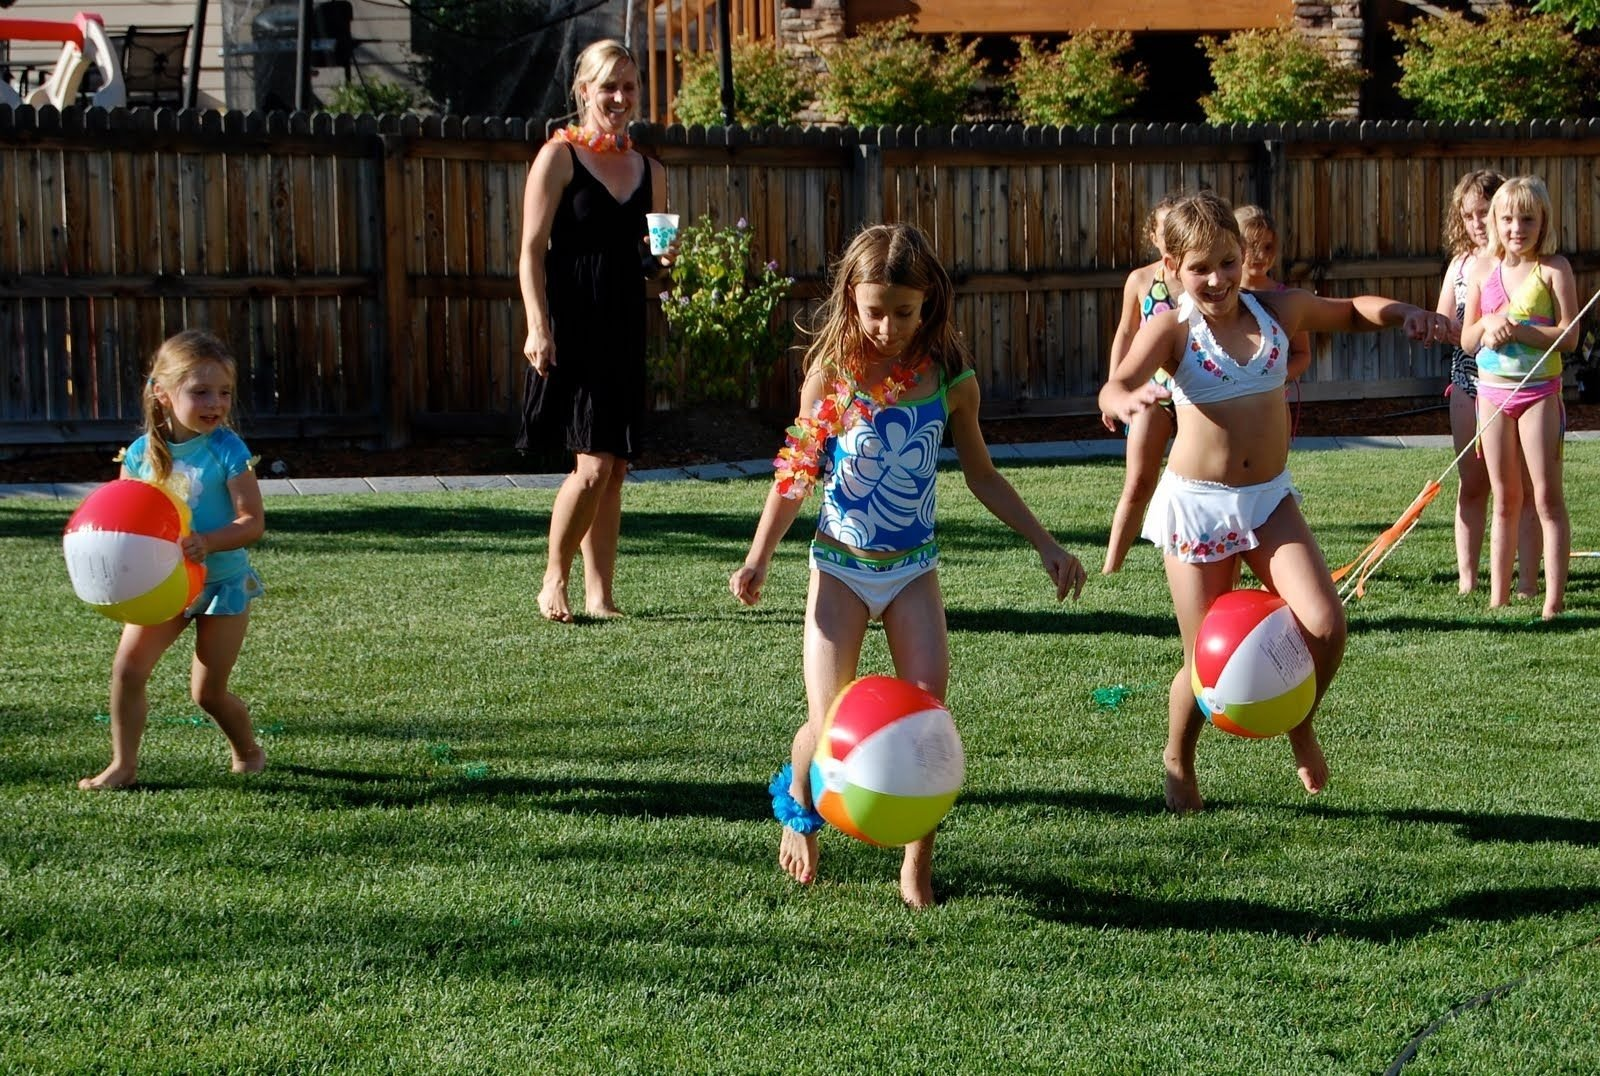 10 Beautiful Relay Race Ideas For Kids beach ball relay games beach ball relay race they had to run 2020